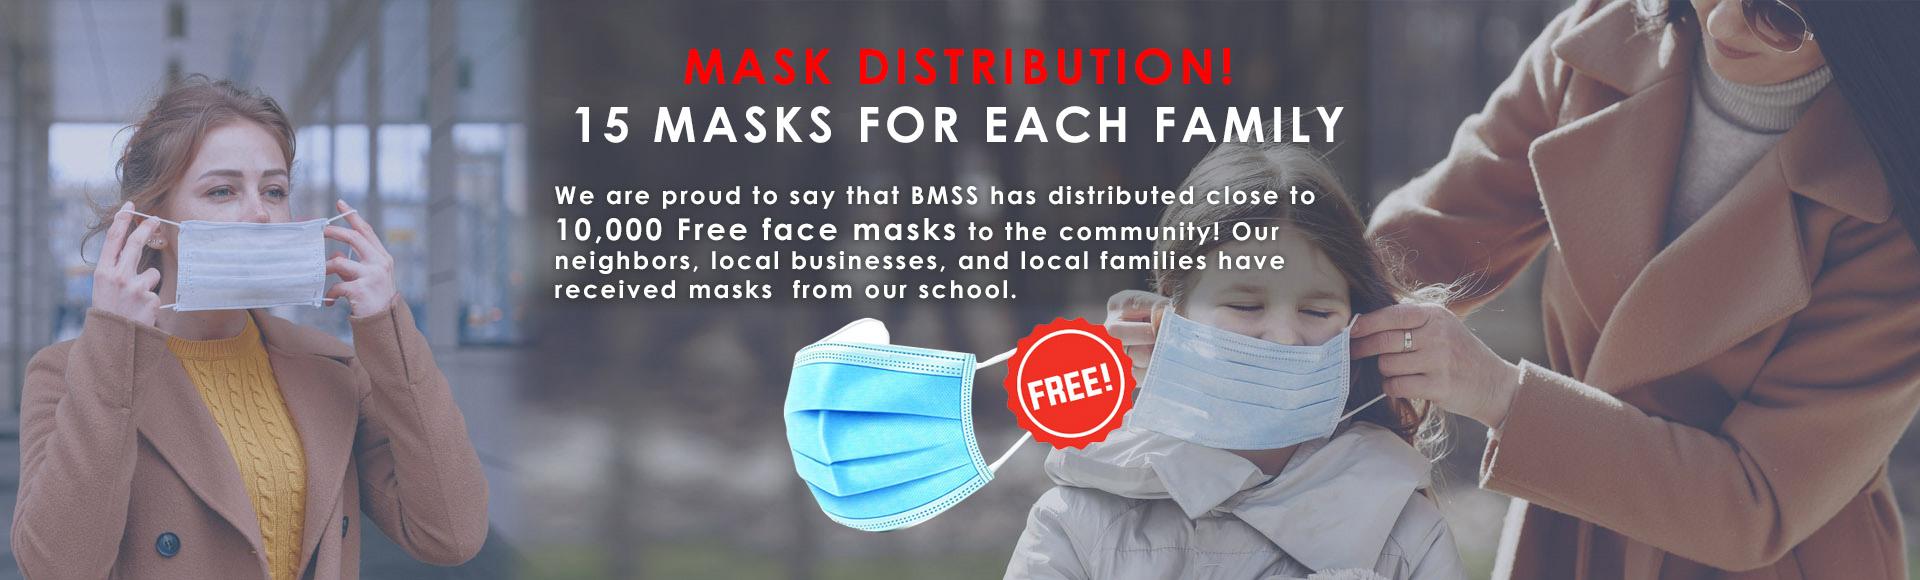 w-masks-bmss